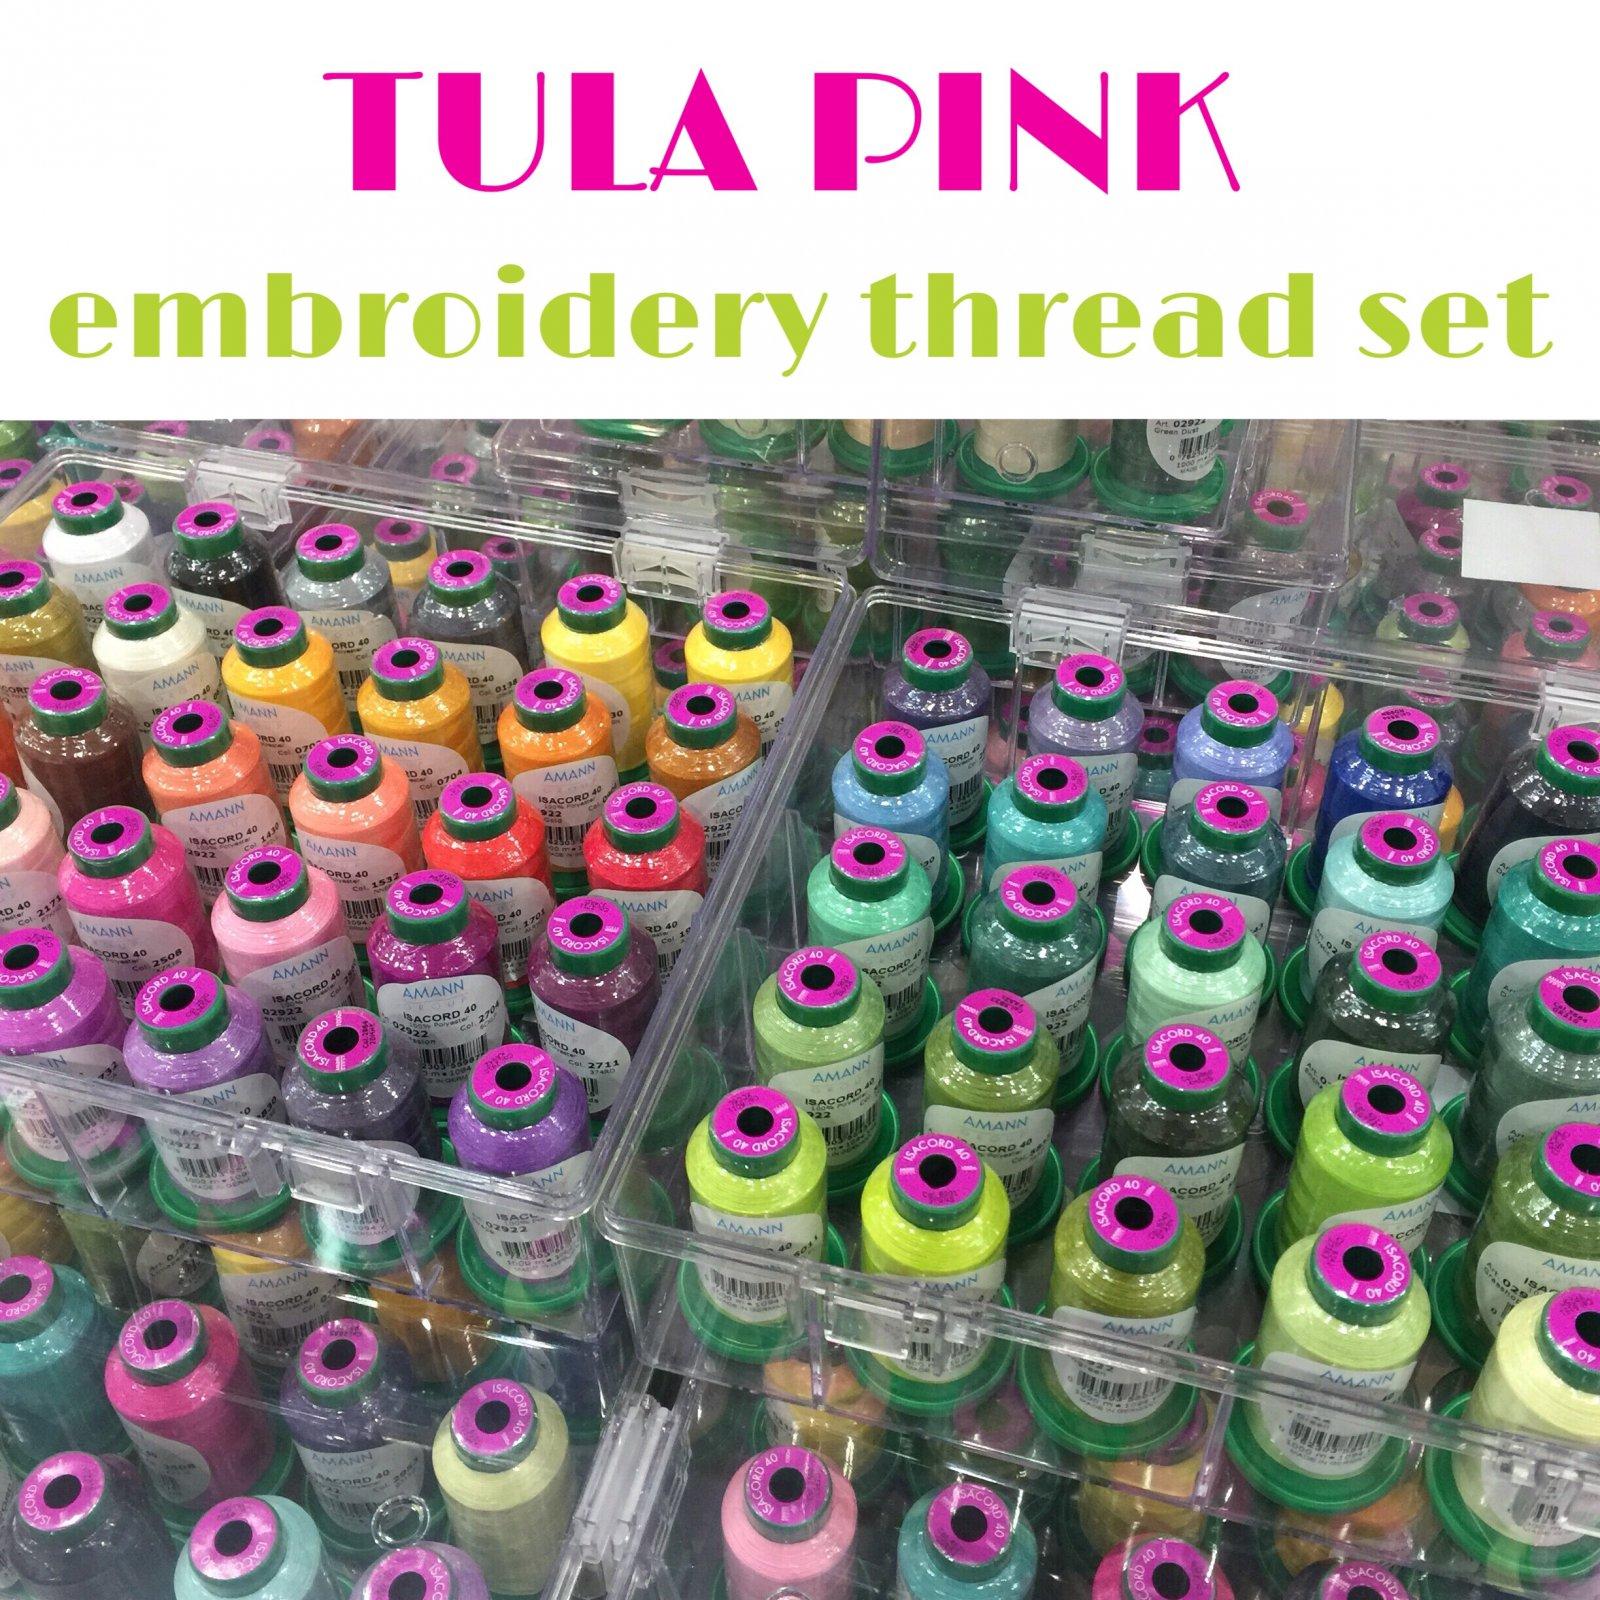 Tula Pink Thread Set